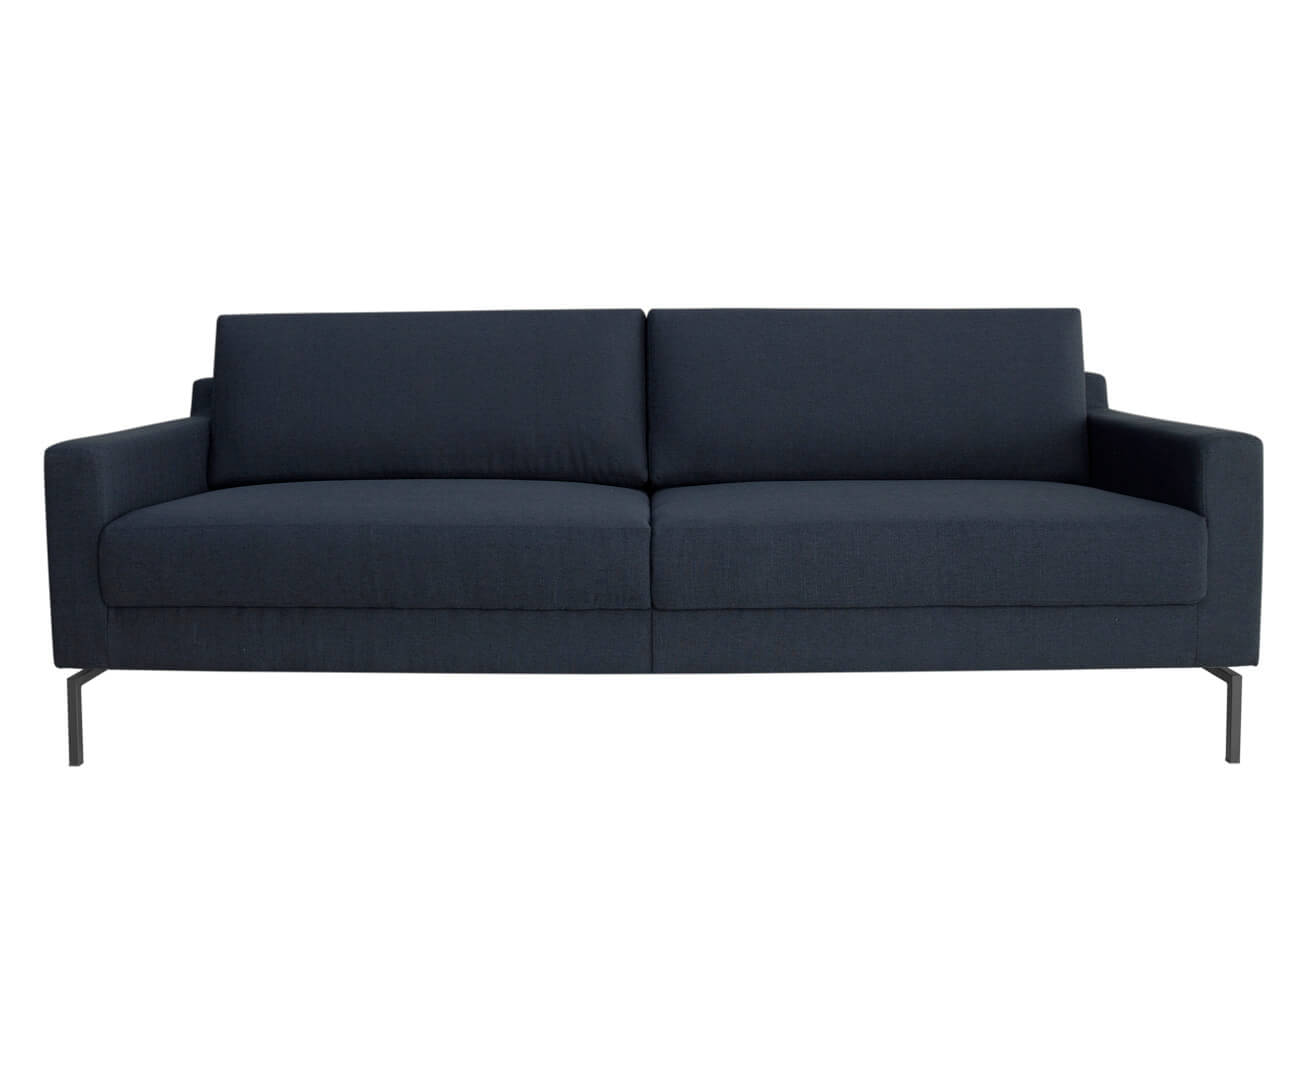 sofá bipartido 3 lugares boxy 1092